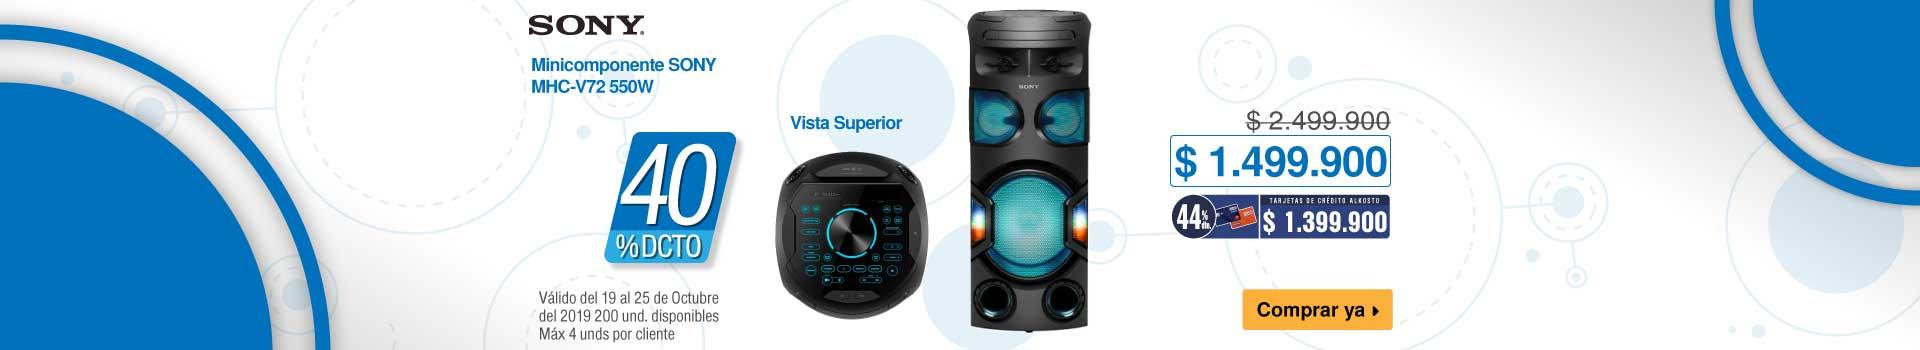 AK-KT-AUDIO-SONY-V72-HIPER4-19OCT